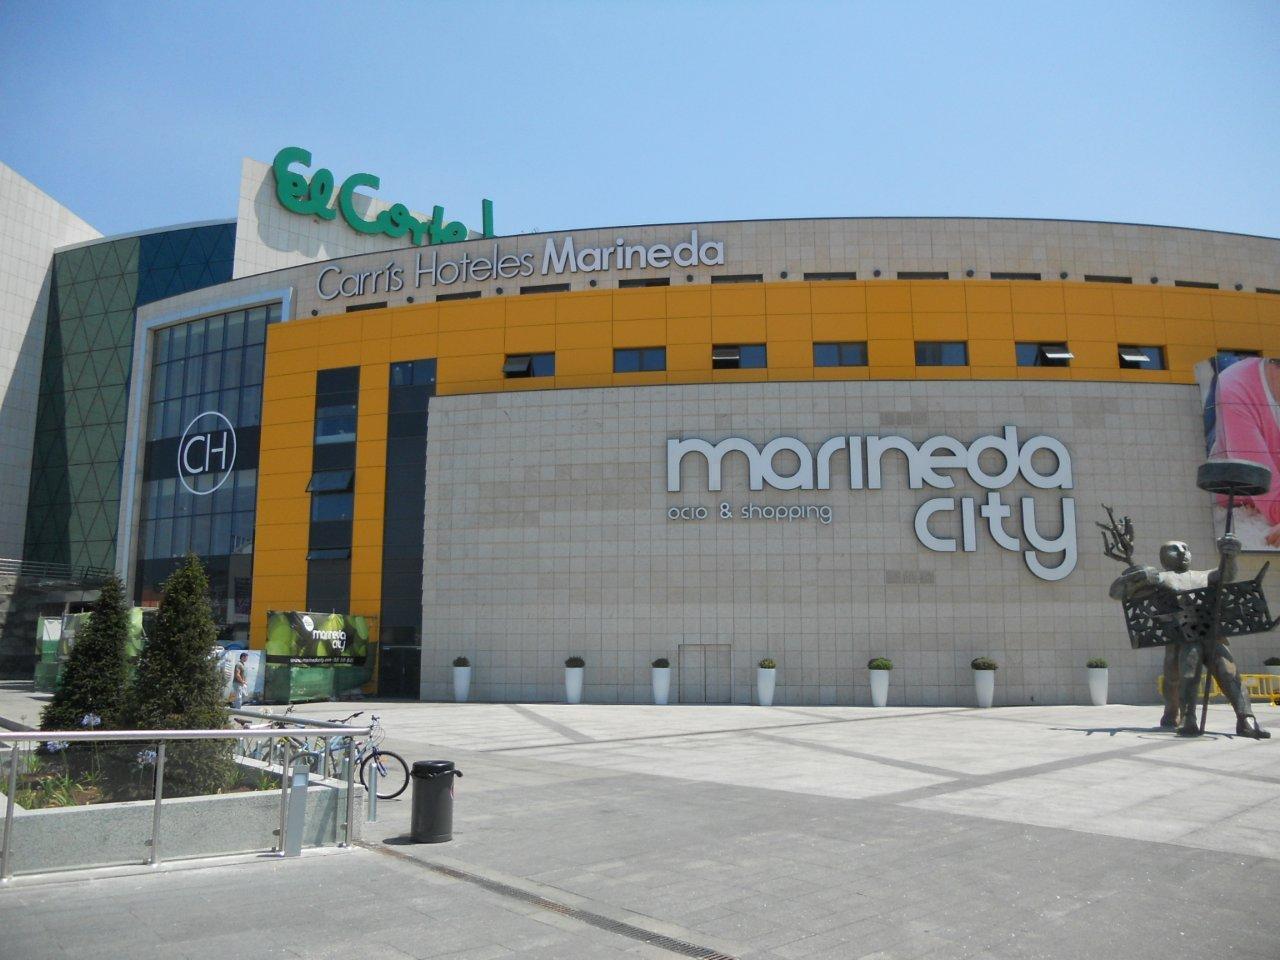 1. Hotel Carris Marineda